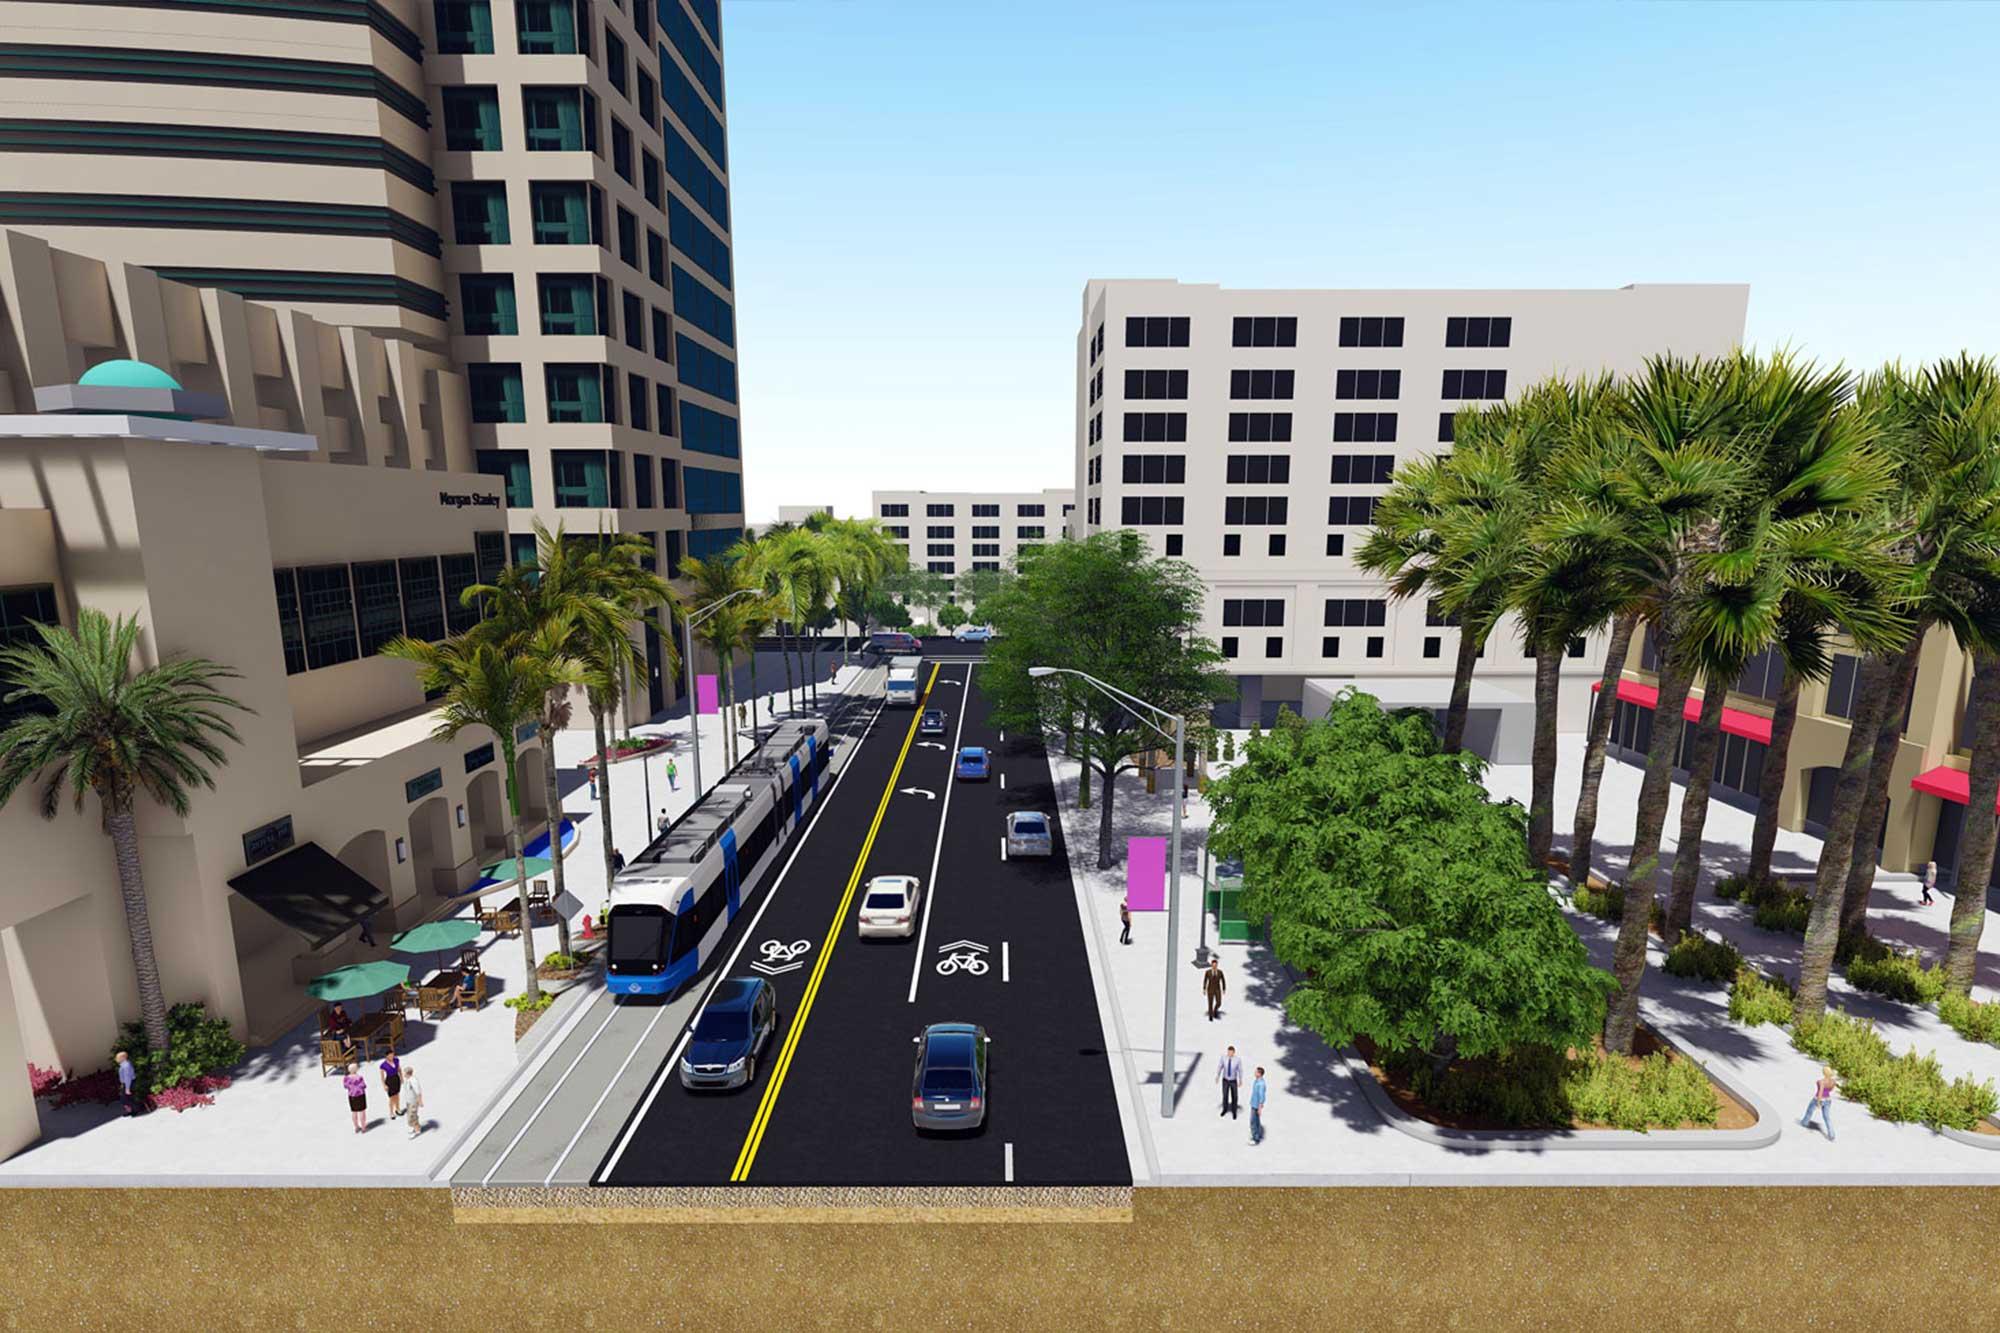 LasOlas Blvd. Mobility Improvements